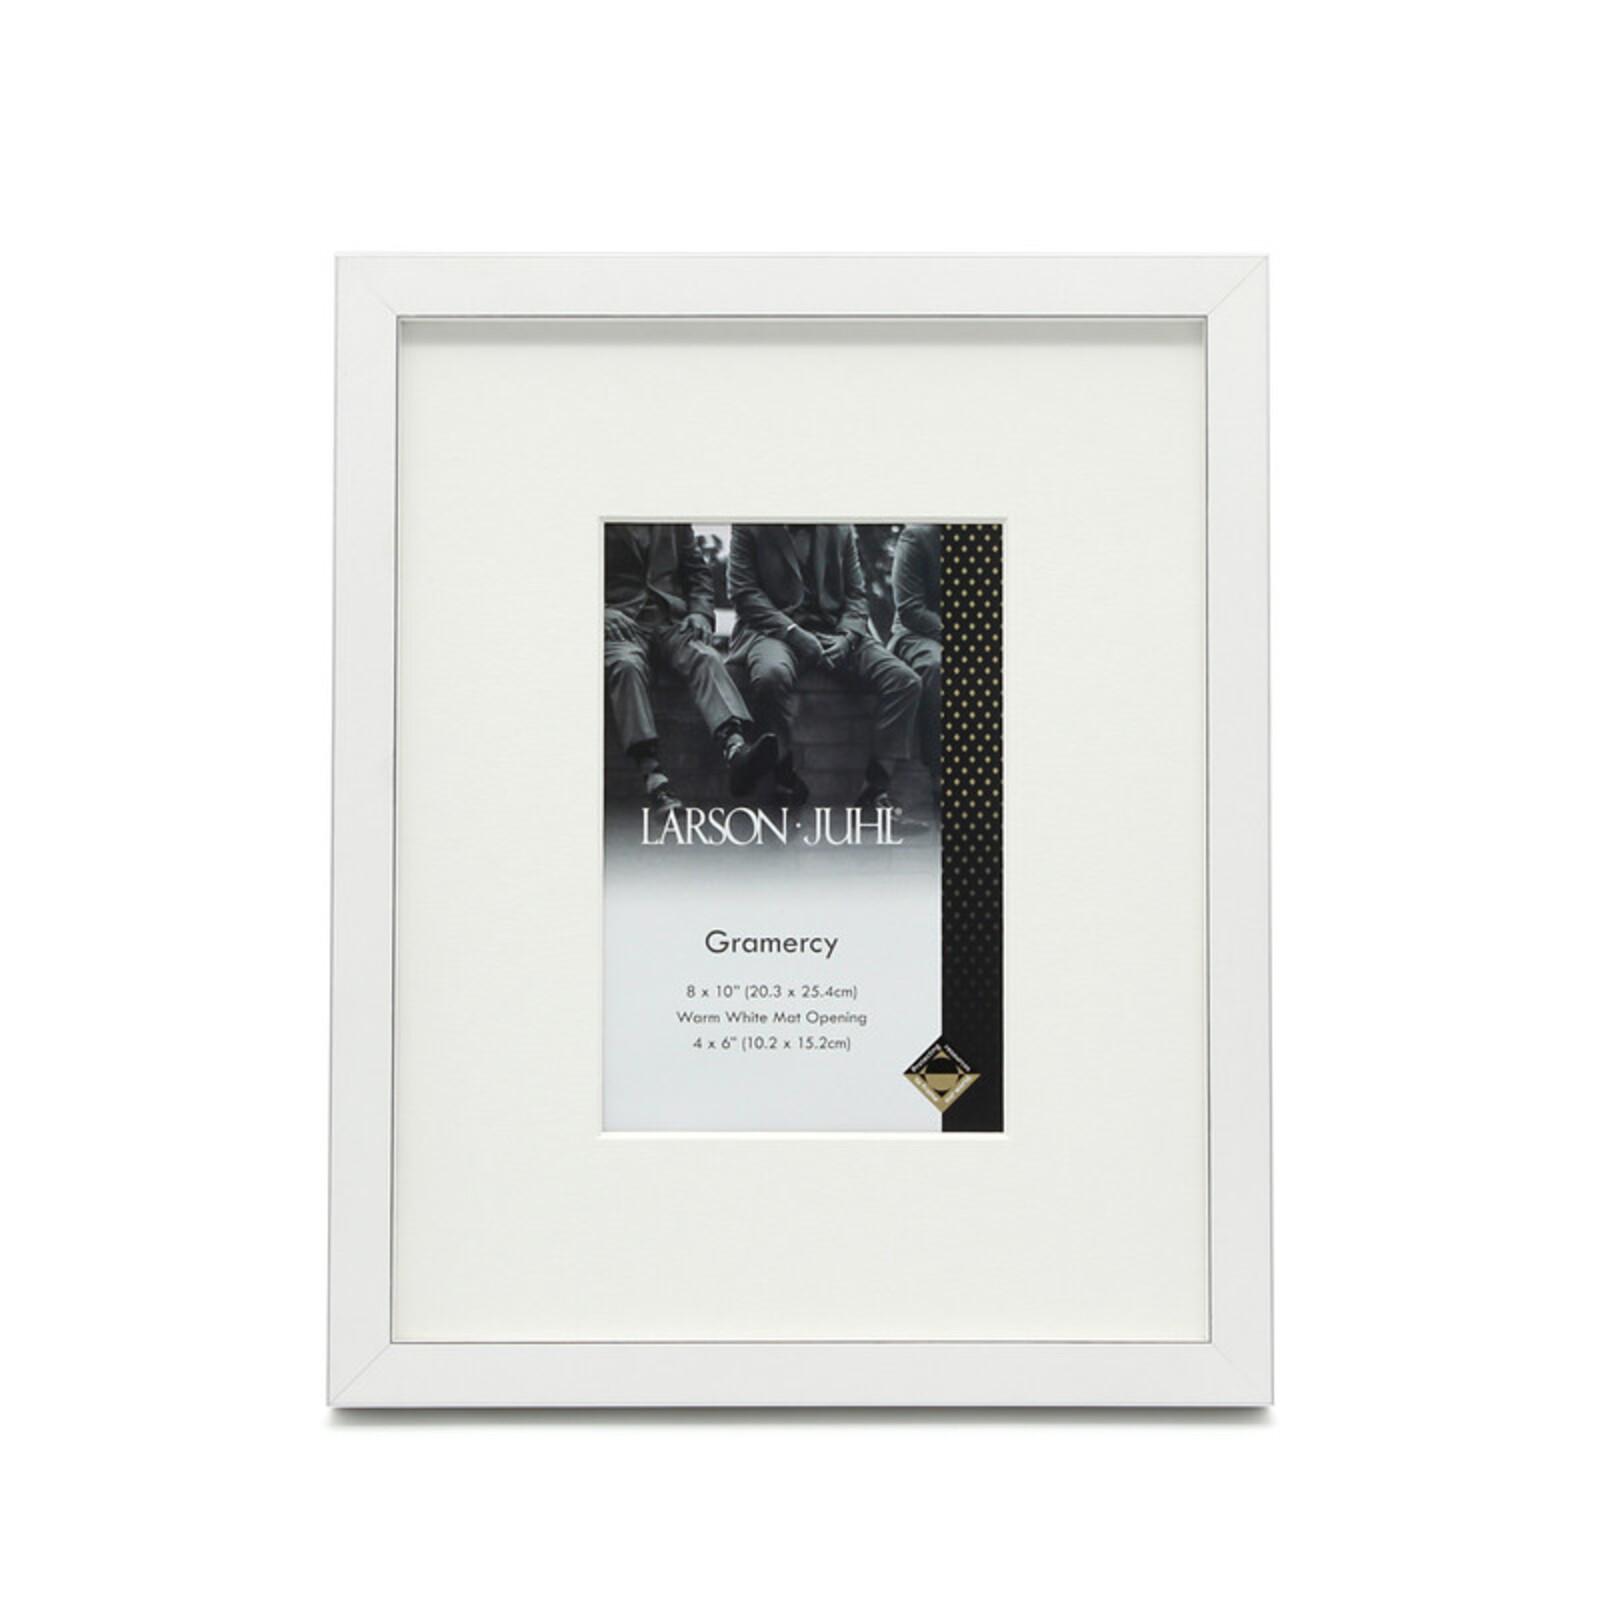 Gramercy 8 x 10inch/4 x 6inch Opening White Photo Frame